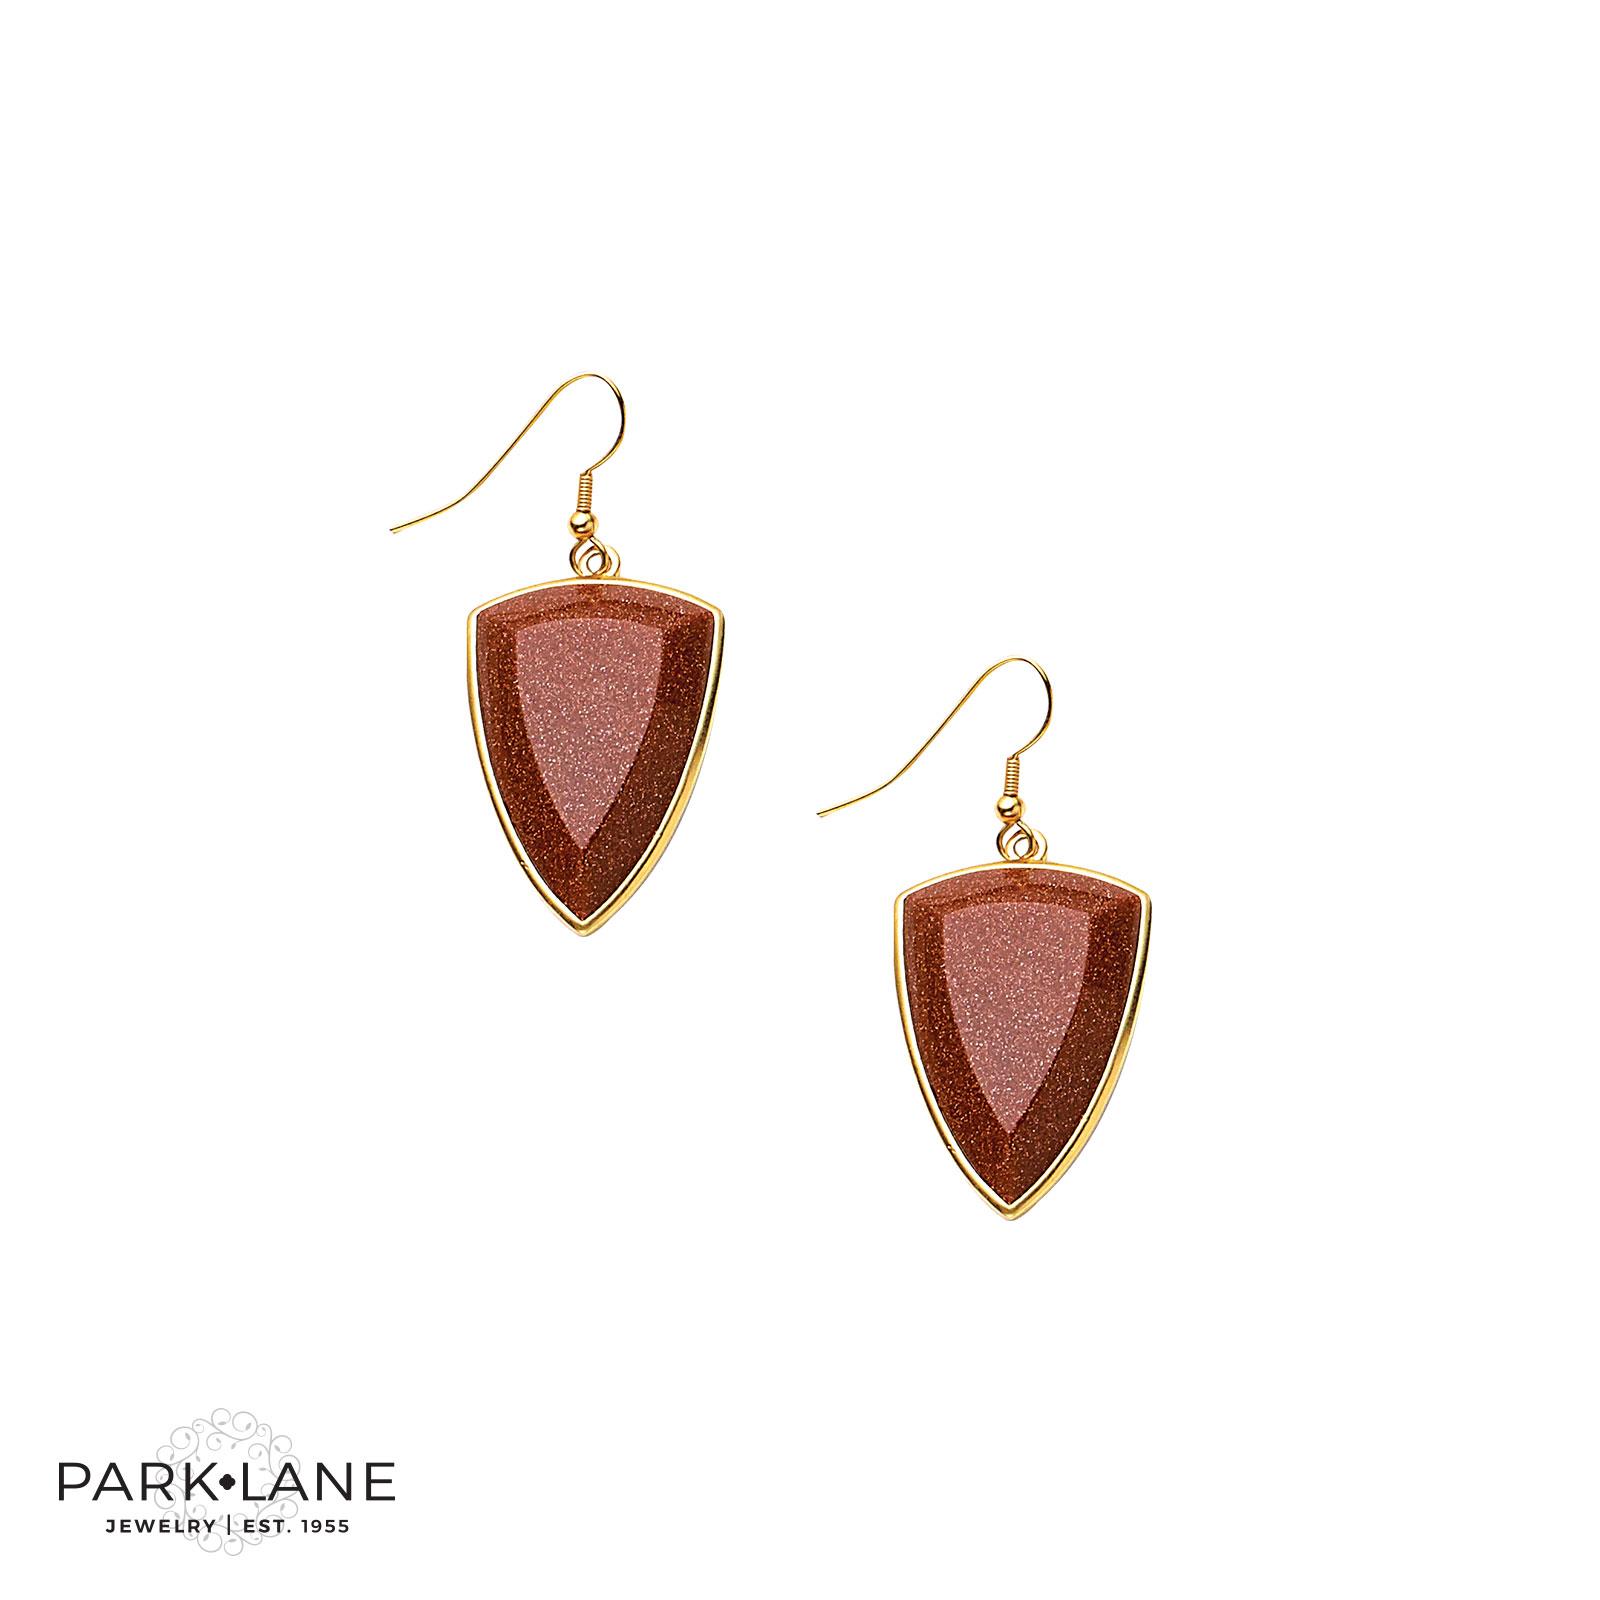 Dubai Pierced Earrings Product Video